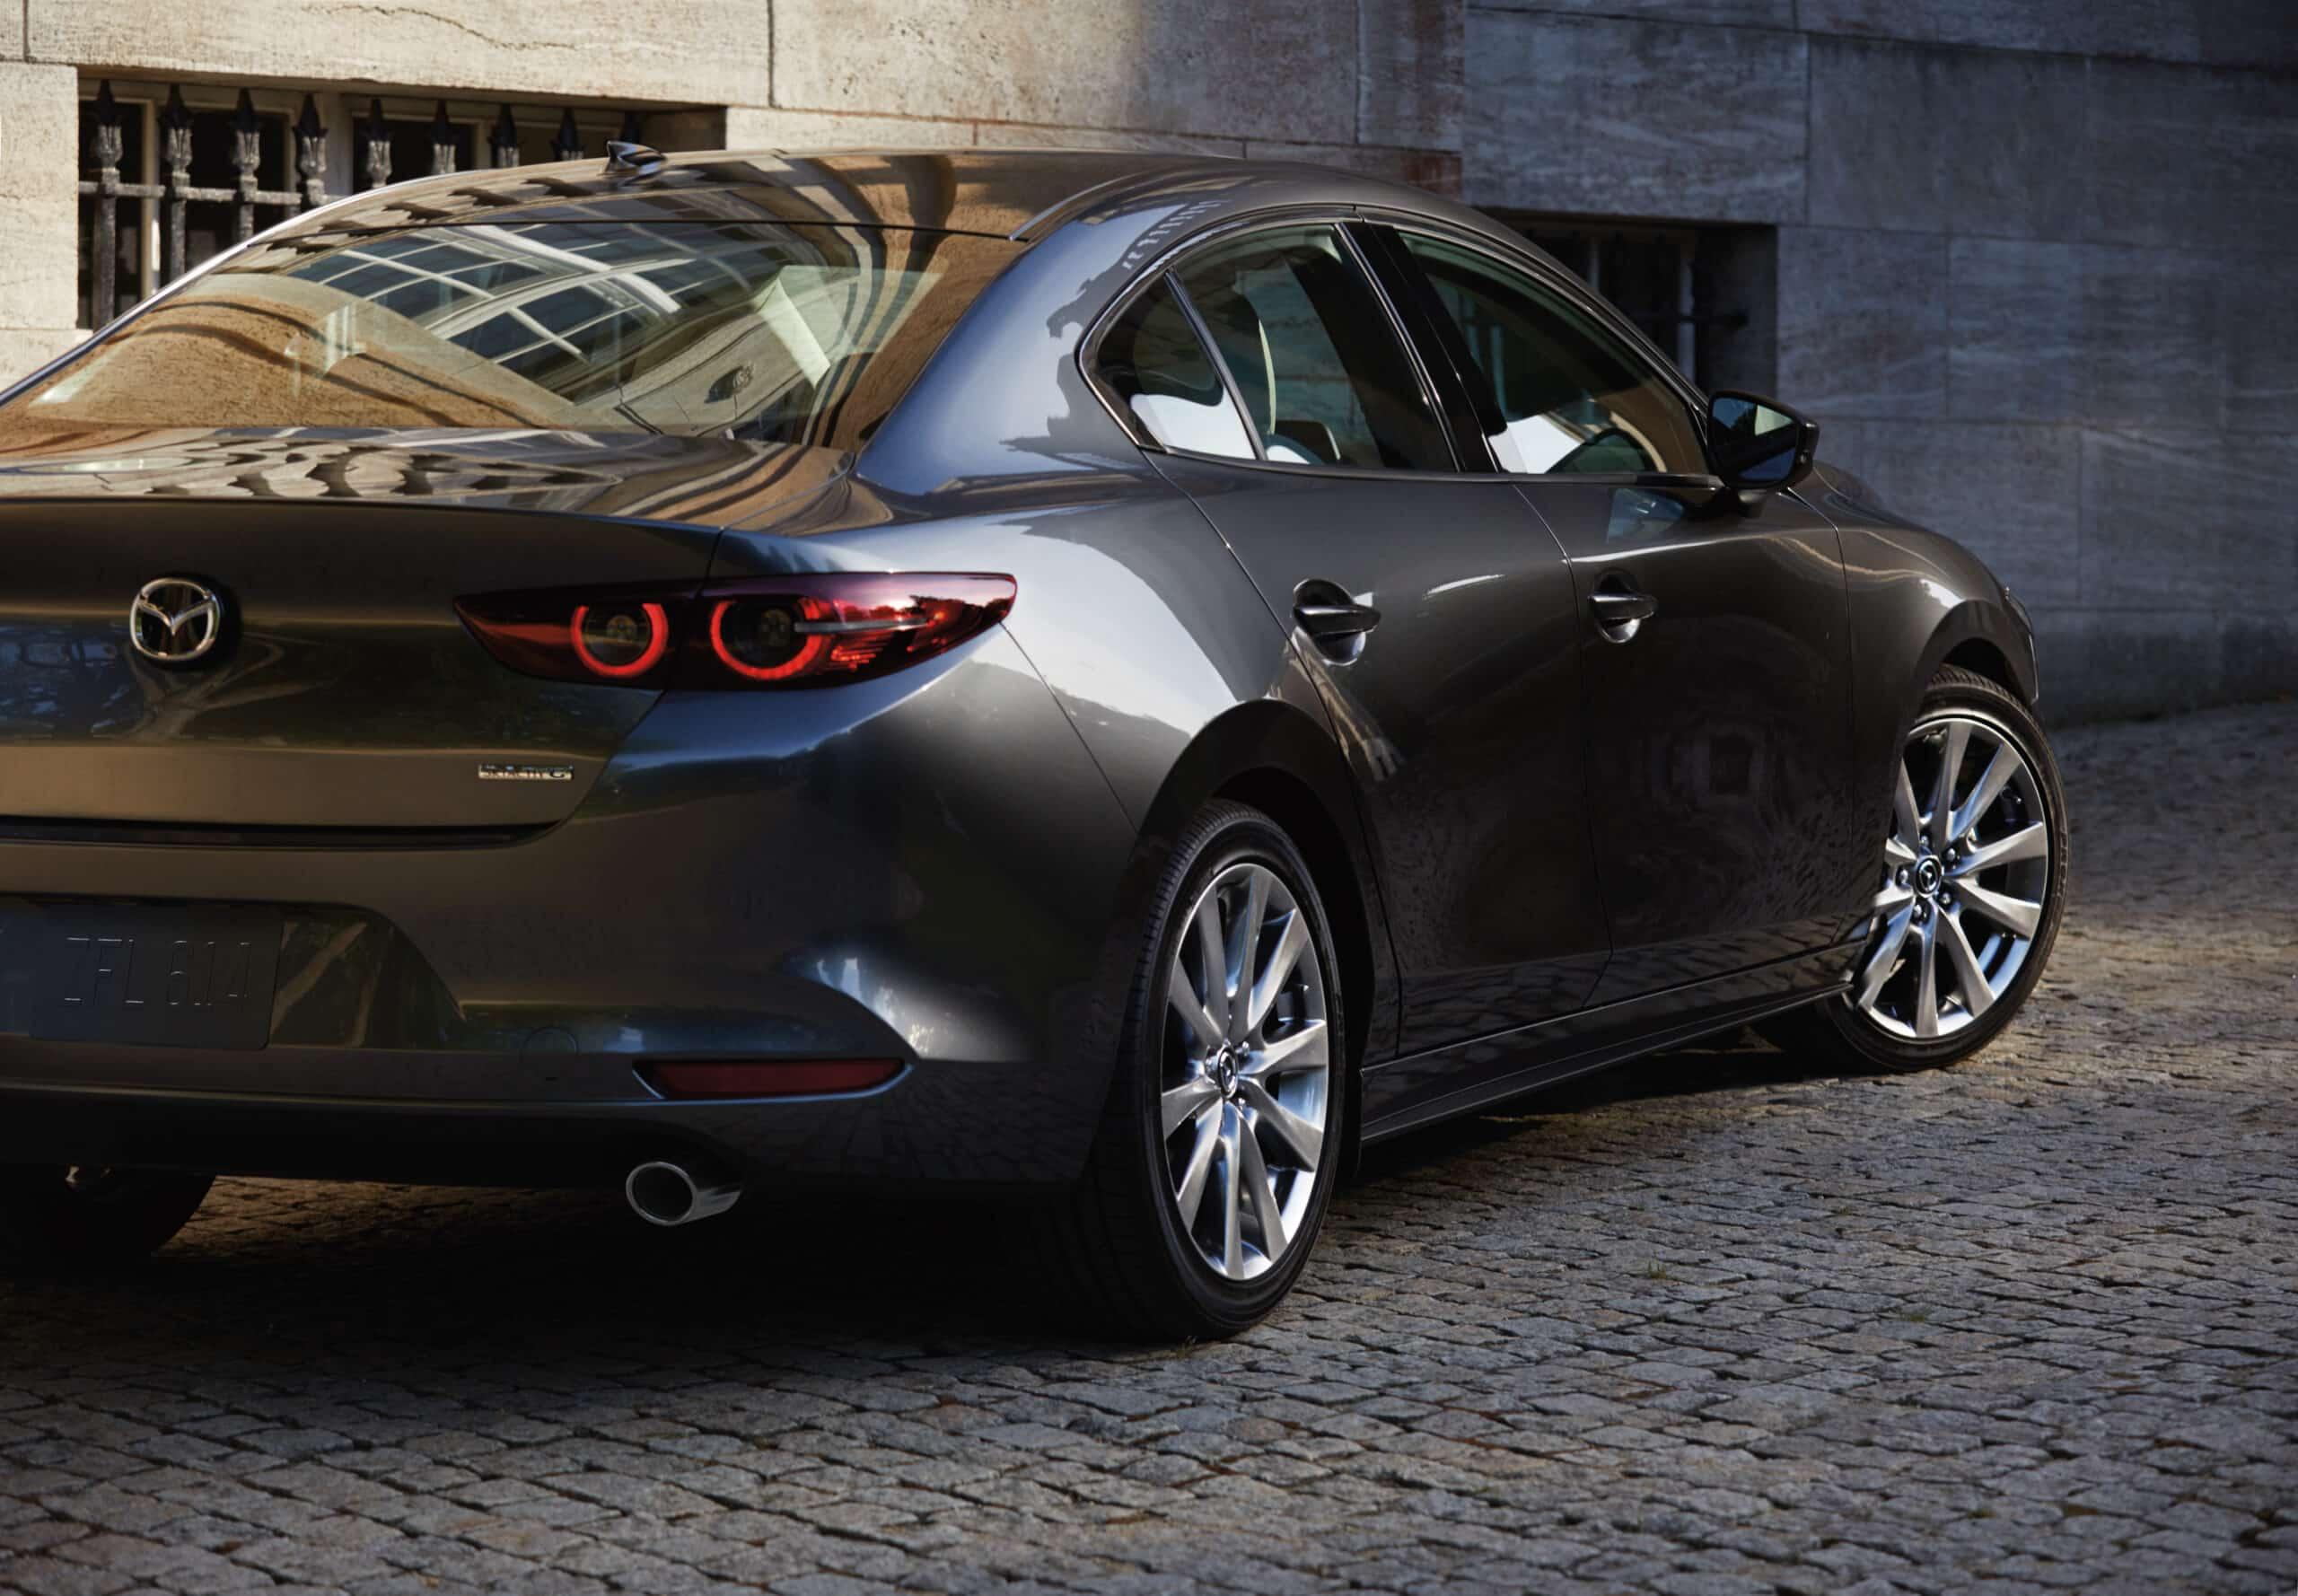 Arrière de la Mazda3 2020 berline